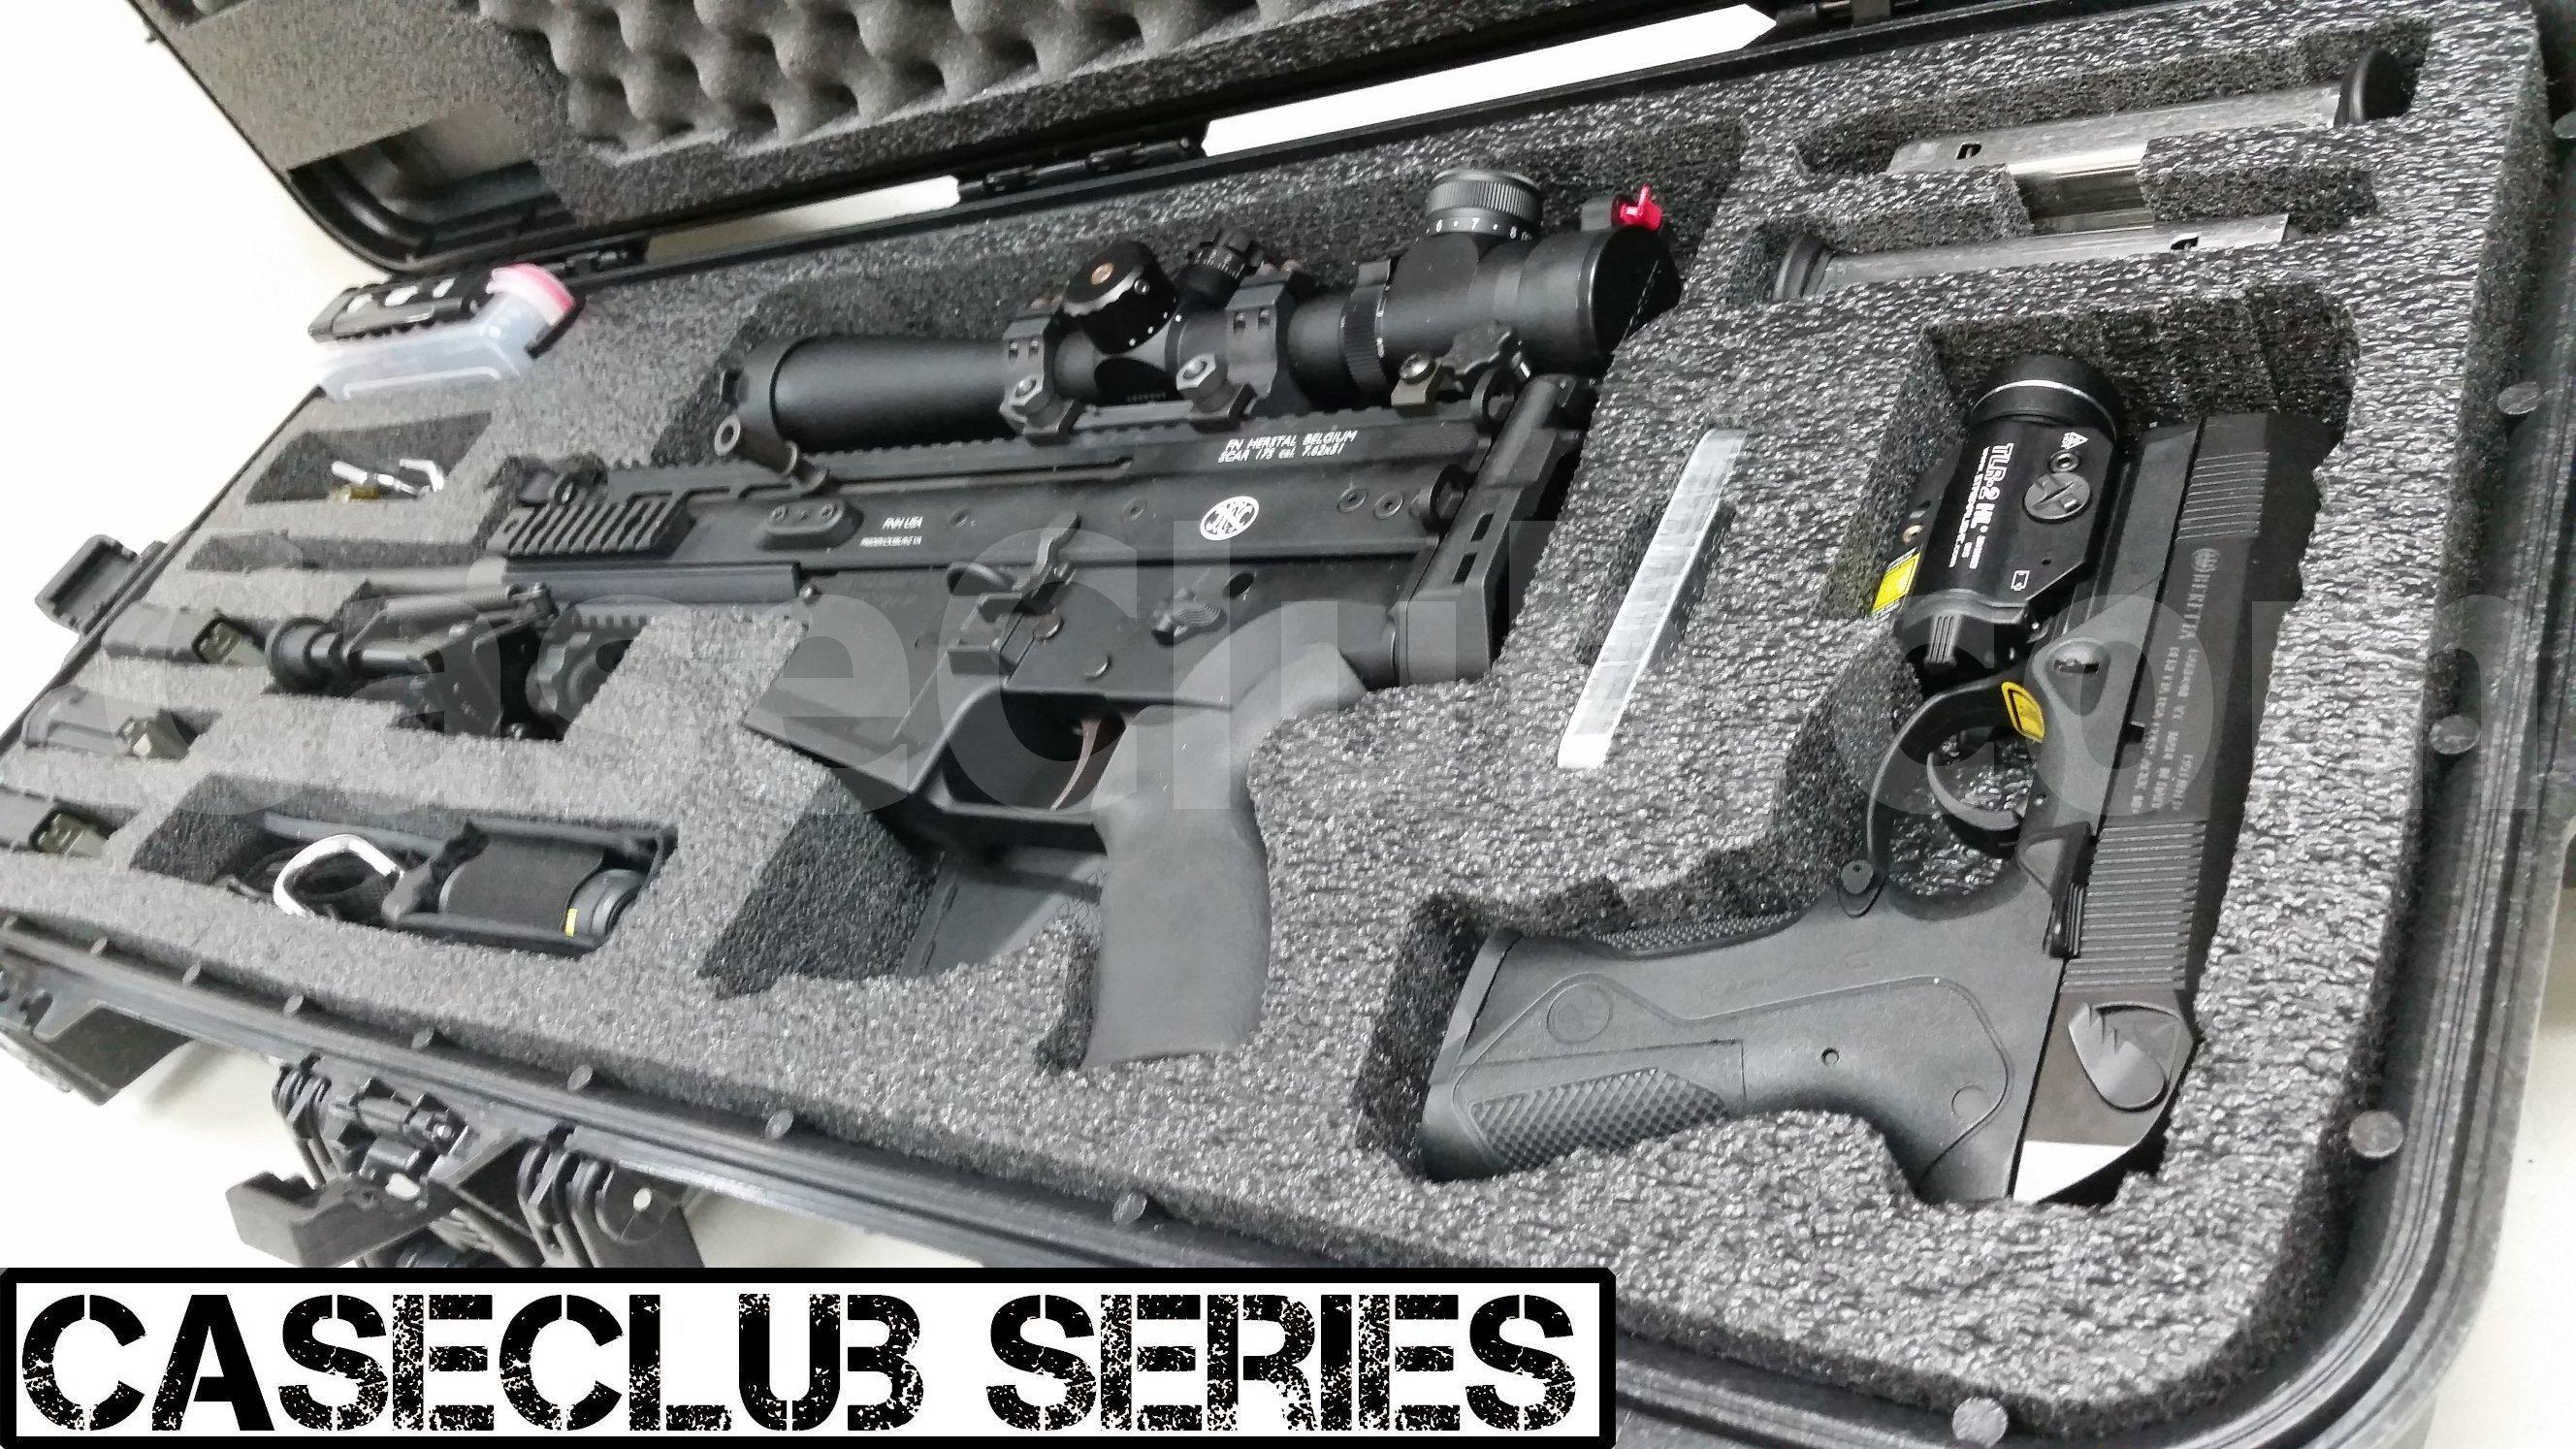 Case Club Waterproof FNH Scar 17S Rifle Case with Silica Gel & Accessory Box